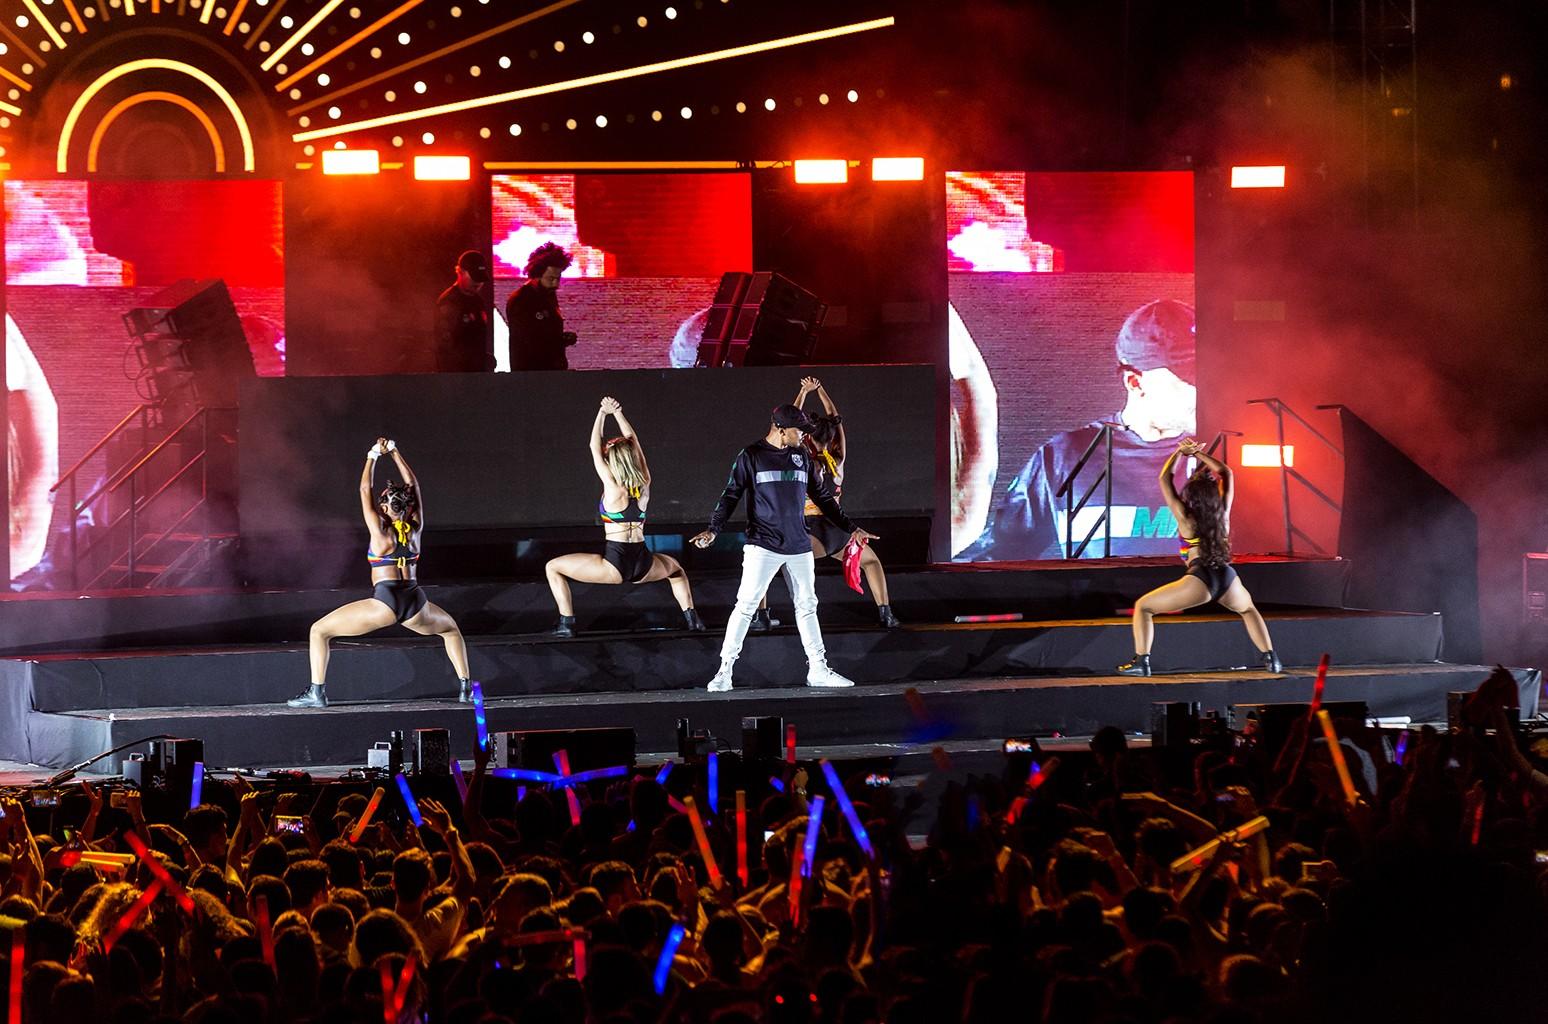 Major Lazer perform at Live Park on Sept. 13, 2016 in Rishon LeZion, Israel.